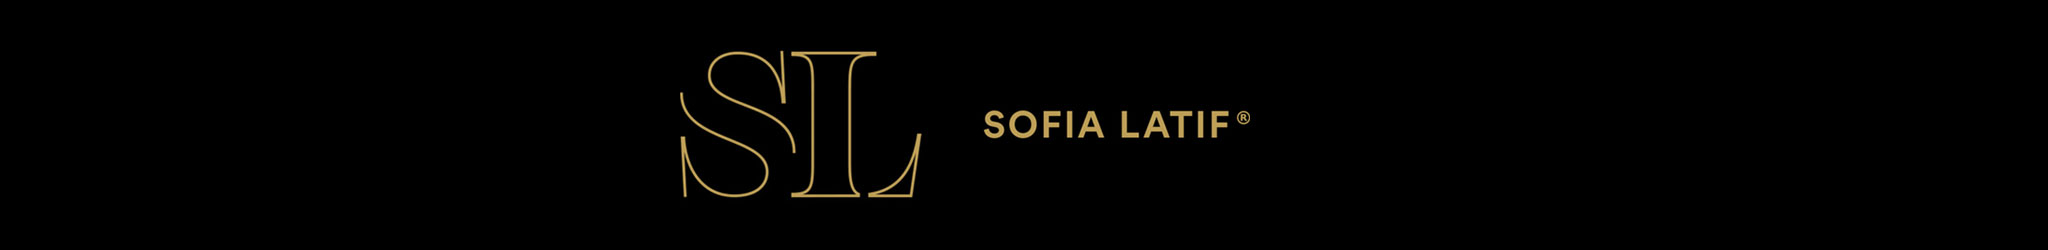 SOFIA LATIF